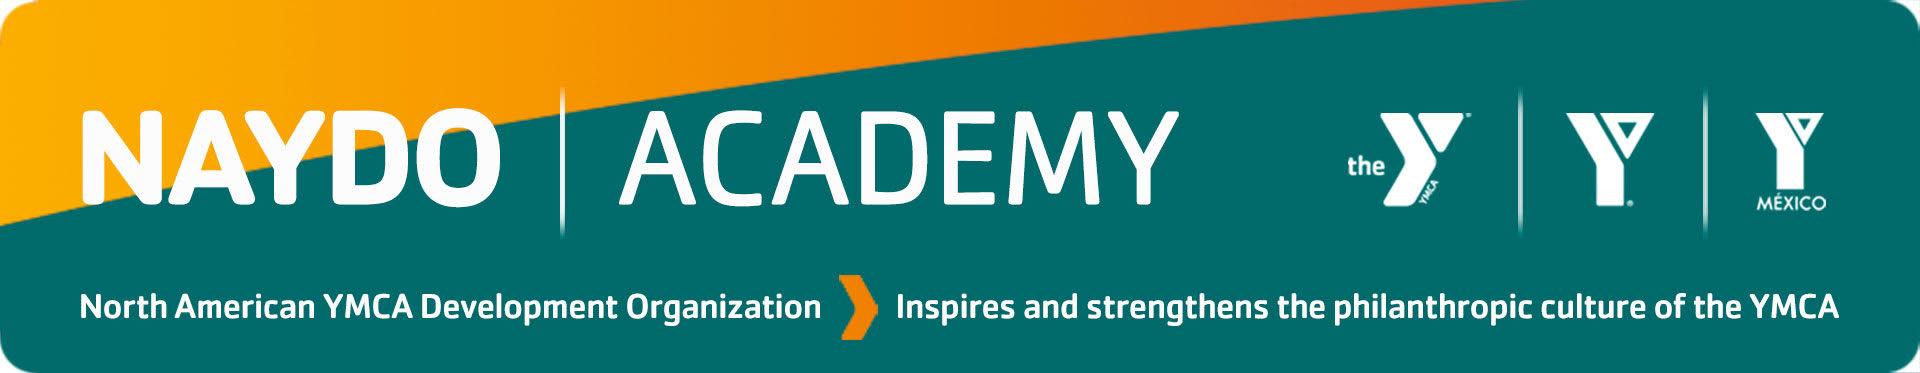 Marketing & Communications NAYDO Academy Philanthropy School Fundamental